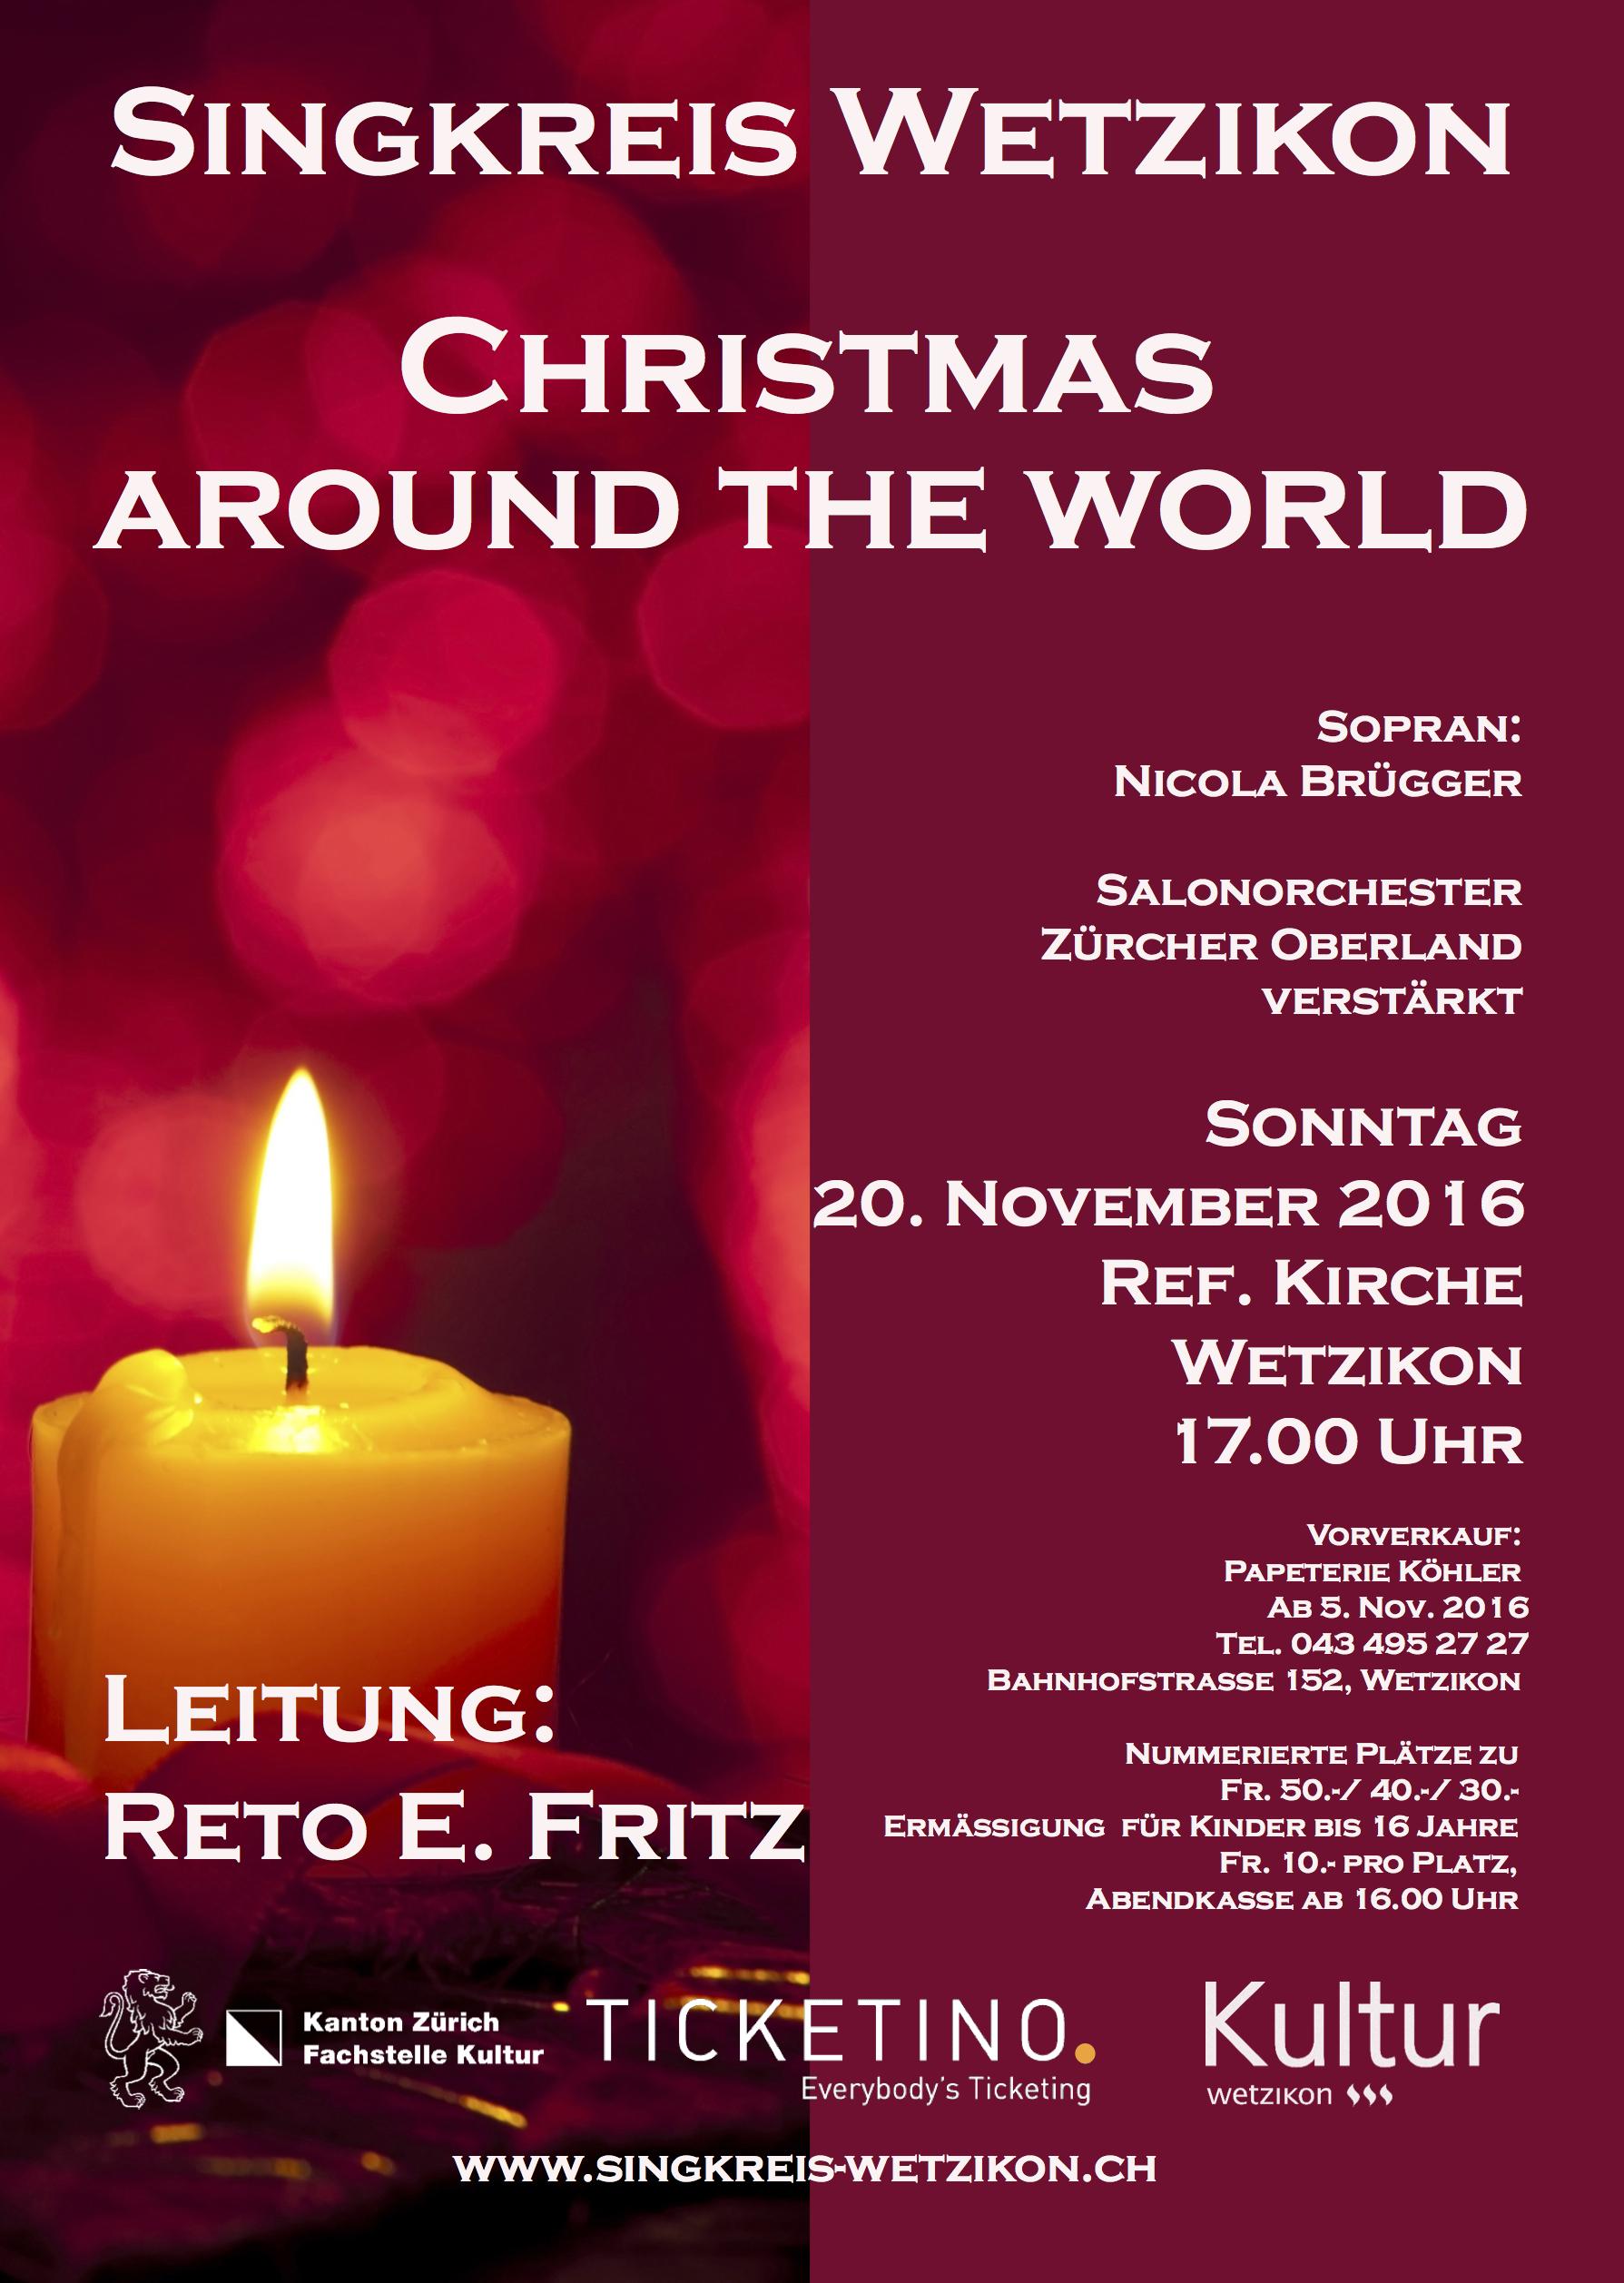 Christmas Around The World, 20. November 2016